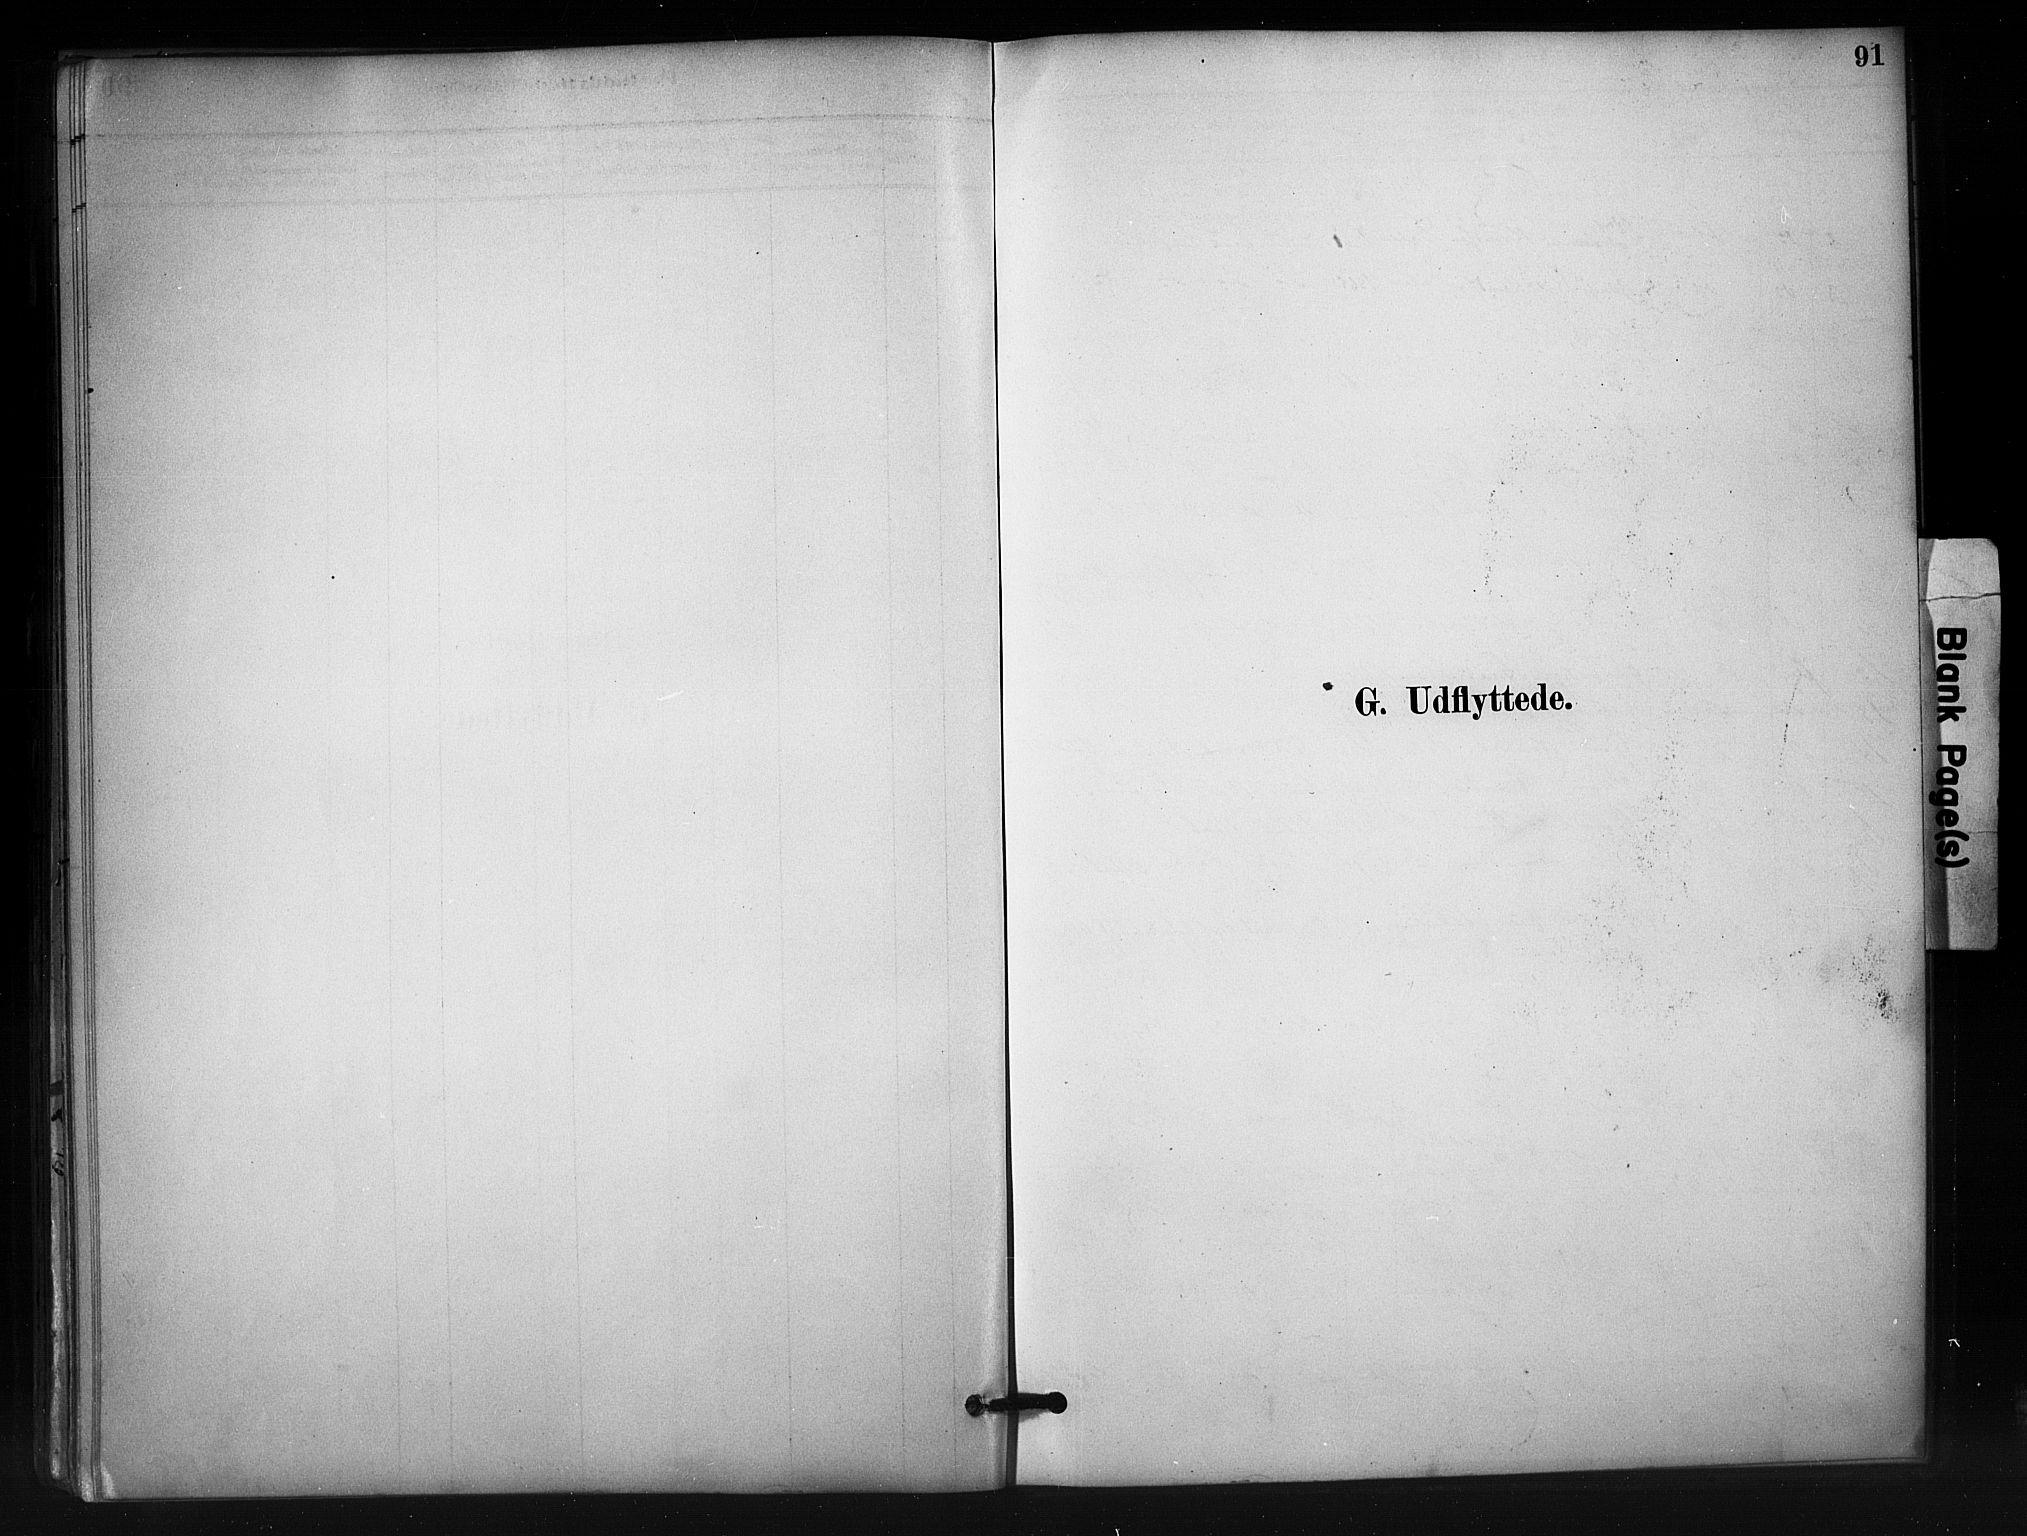 SAH, Nord-Aurdal prestekontor, Ministerialbok nr. 12, 1883-1895, s. 91